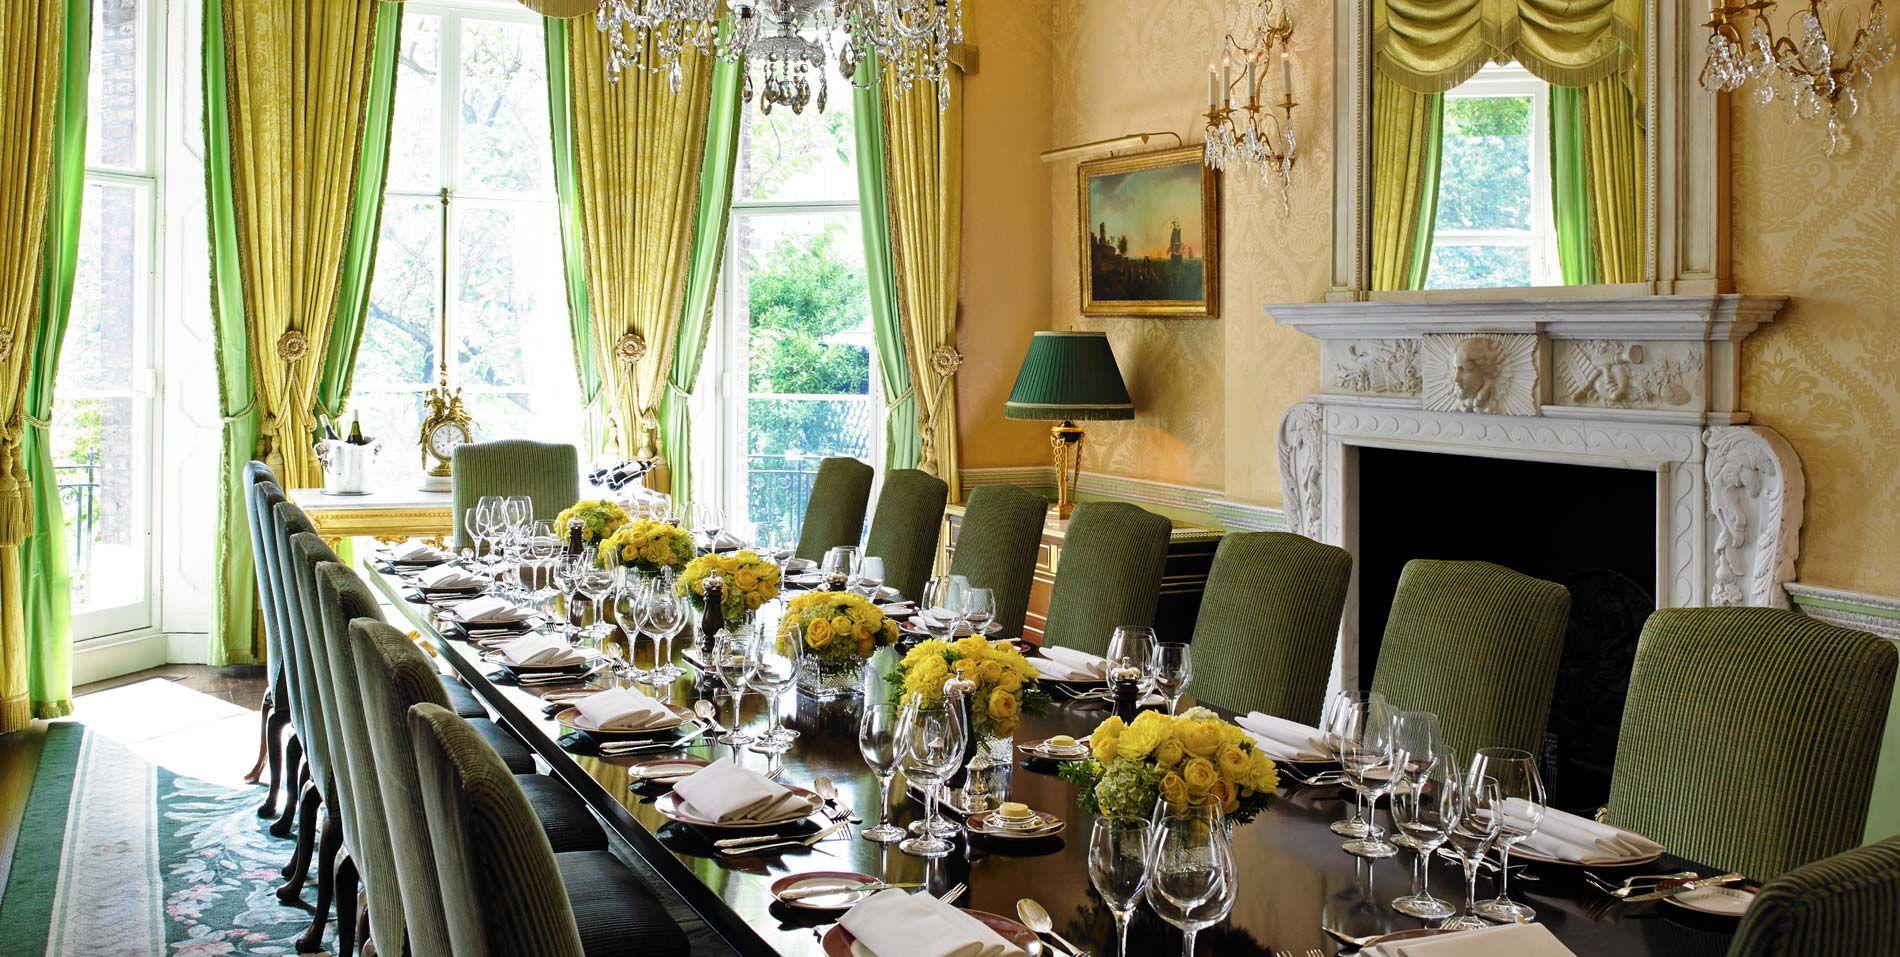 Michael Dobbs House of Cards Ritz The Wimborne Room